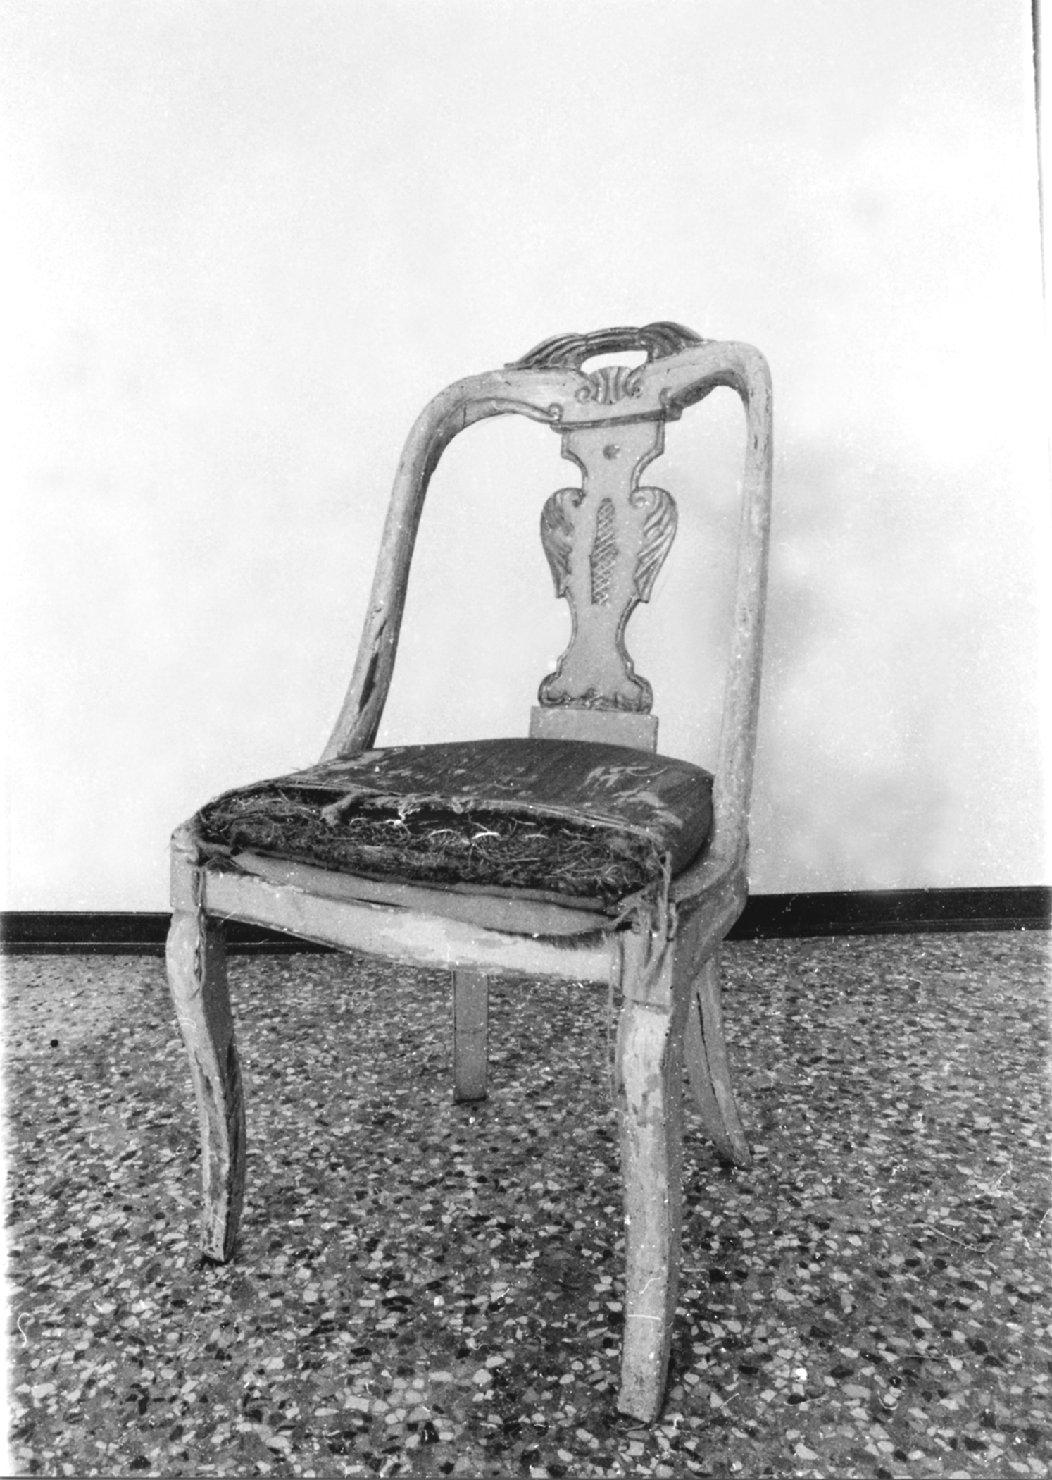 sedia, opera isolata - manifattura lombardo-veneta (secondo quarto sec. XIX)